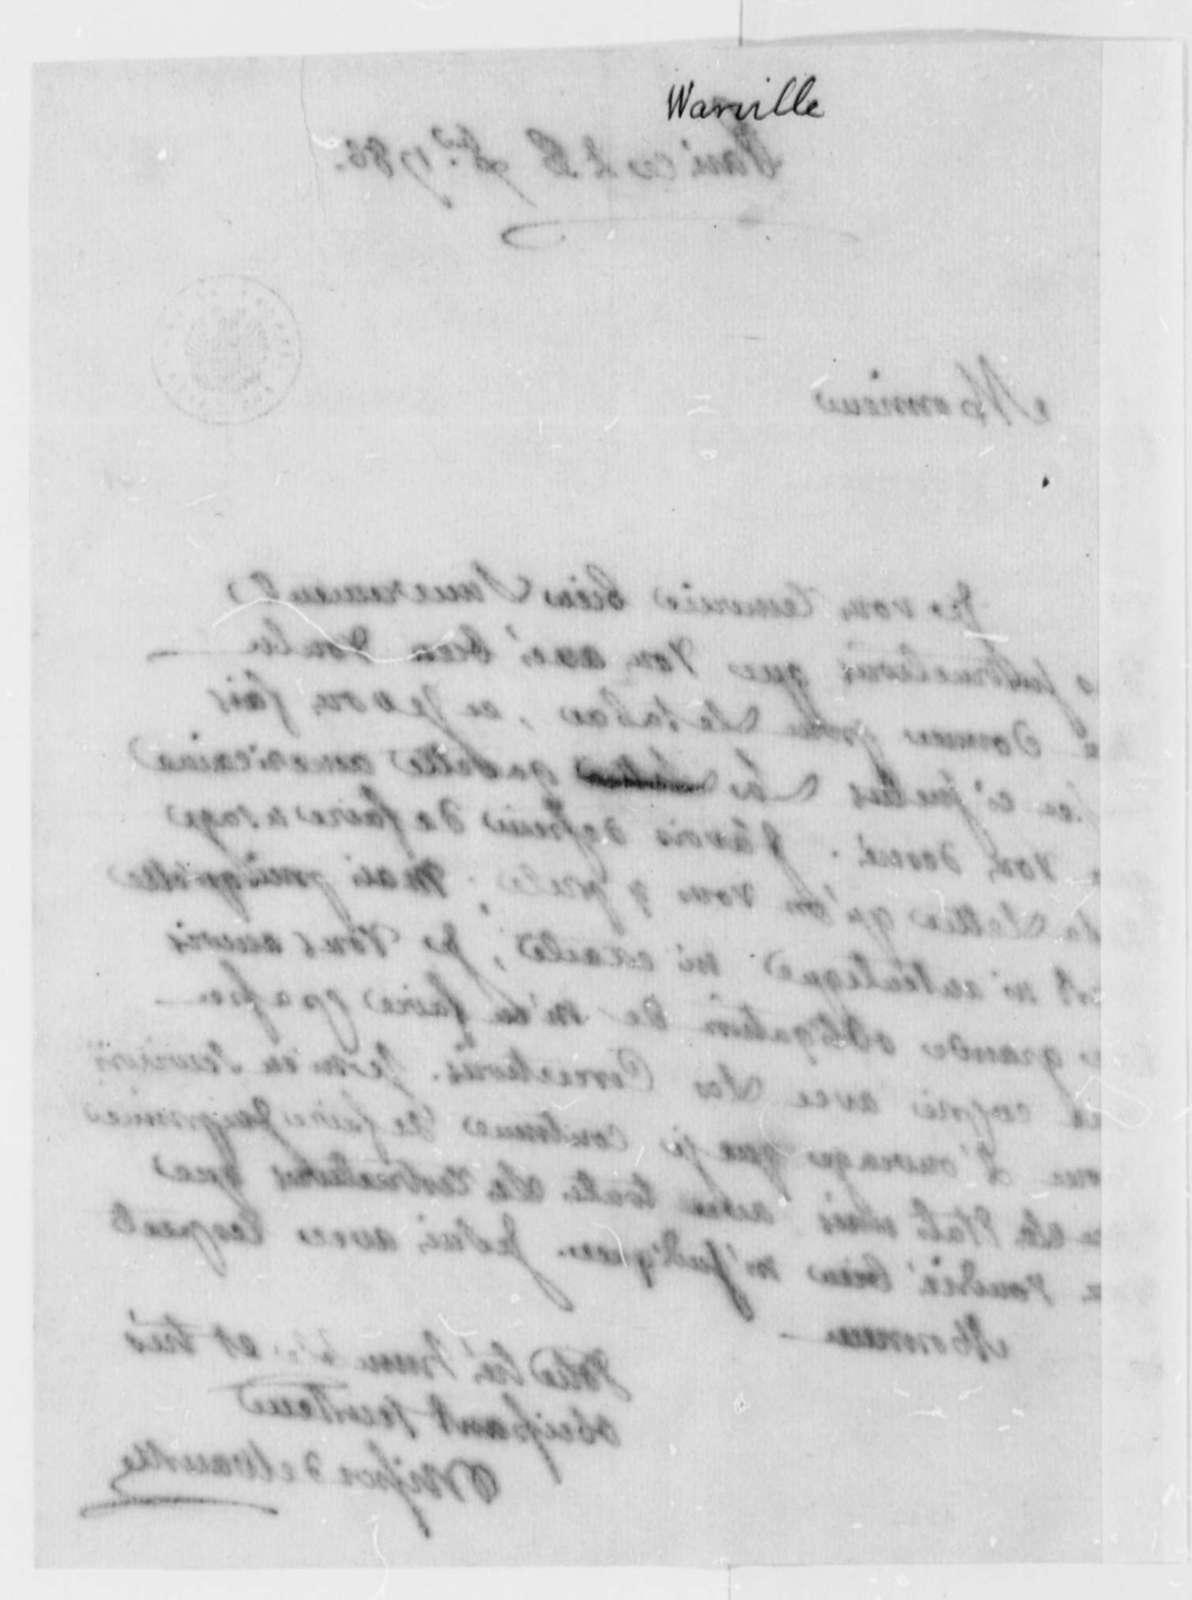 Jean Plumard Brissot de Warville to Thomas Jefferson, December 26, 1786, in French